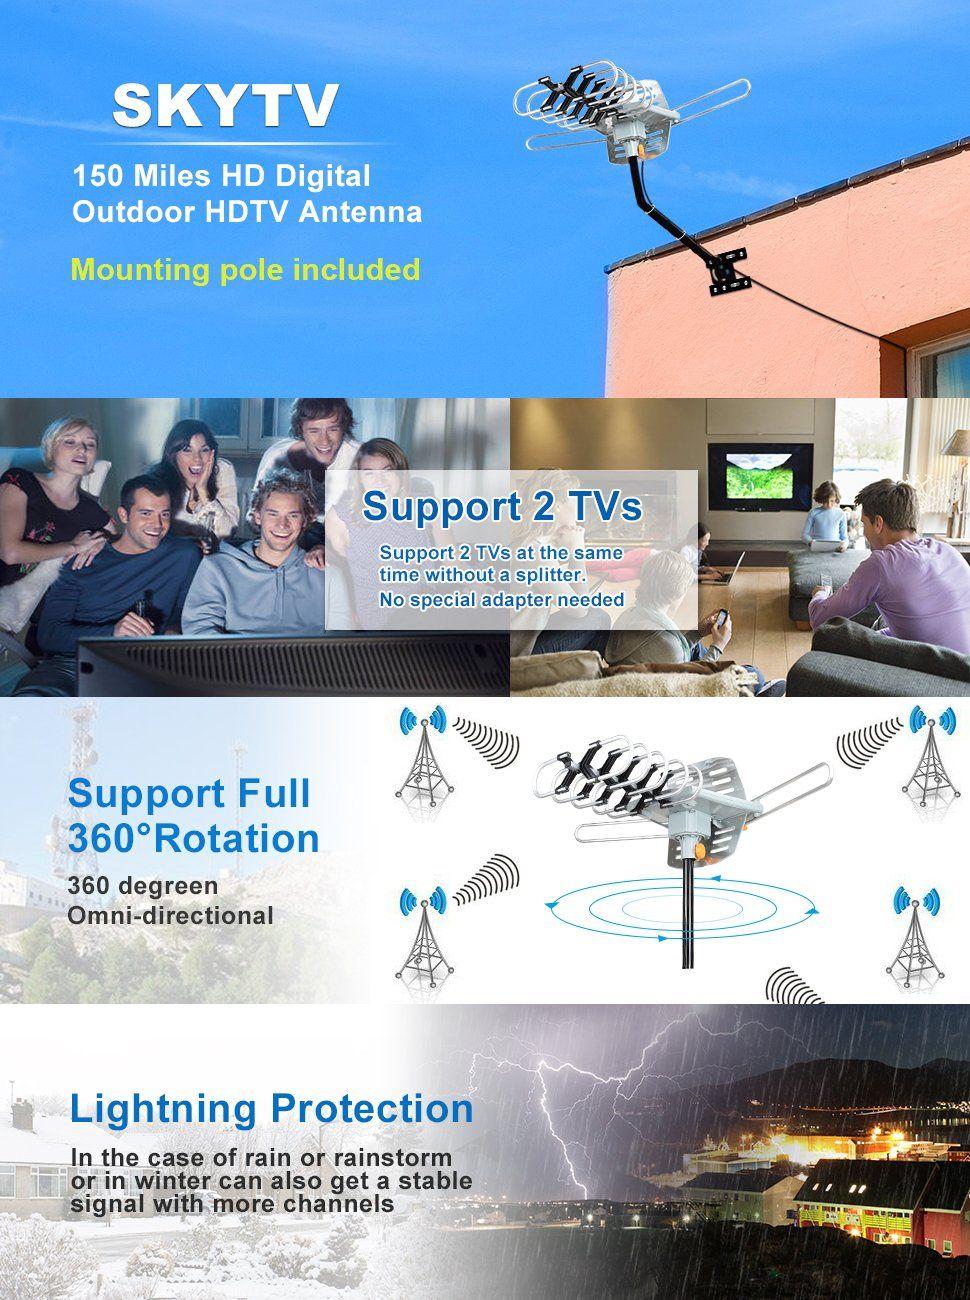 Amazon Com Hdtv Antenna Skytv Amplified Digital Tv Antenna 150 Miles Range 360 Rotation Outdoor Digital Outdoor Hdtv Antenna Digital Hdtv Antenna Digital Tv